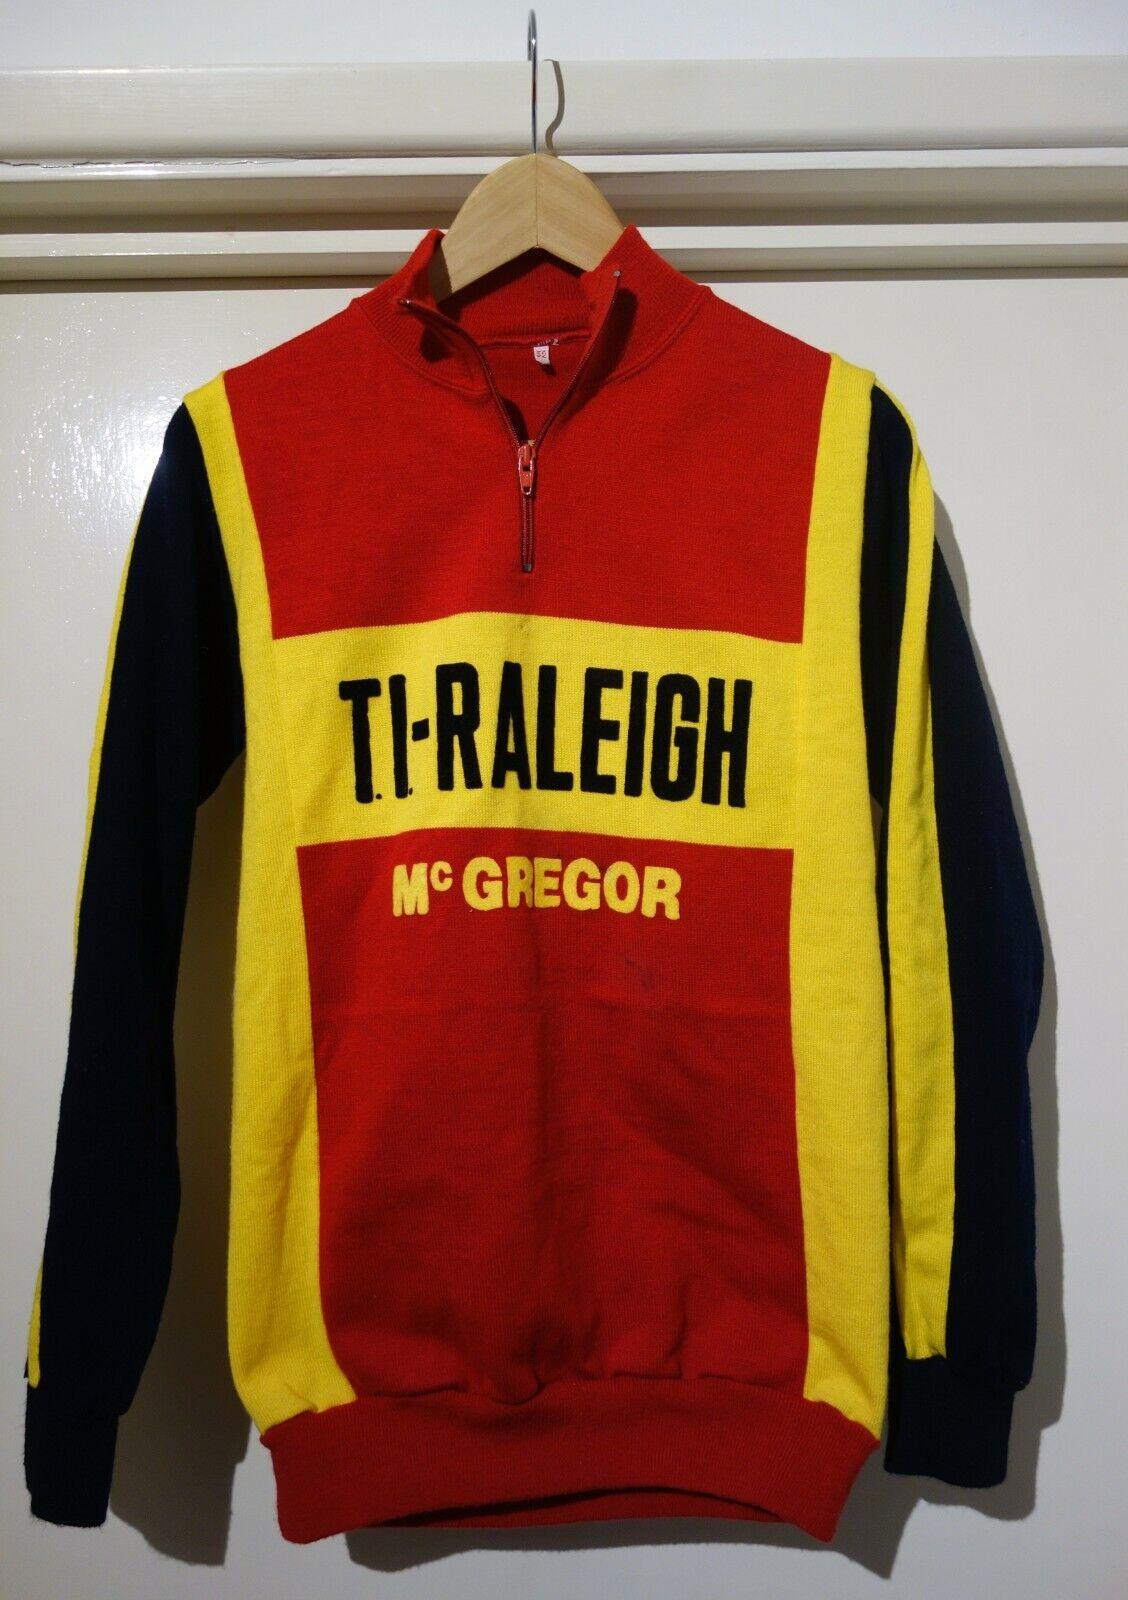 VINTAGE TI RALEIGH McGREGOR Cycling Jersey 1970s Small Medium EROICA